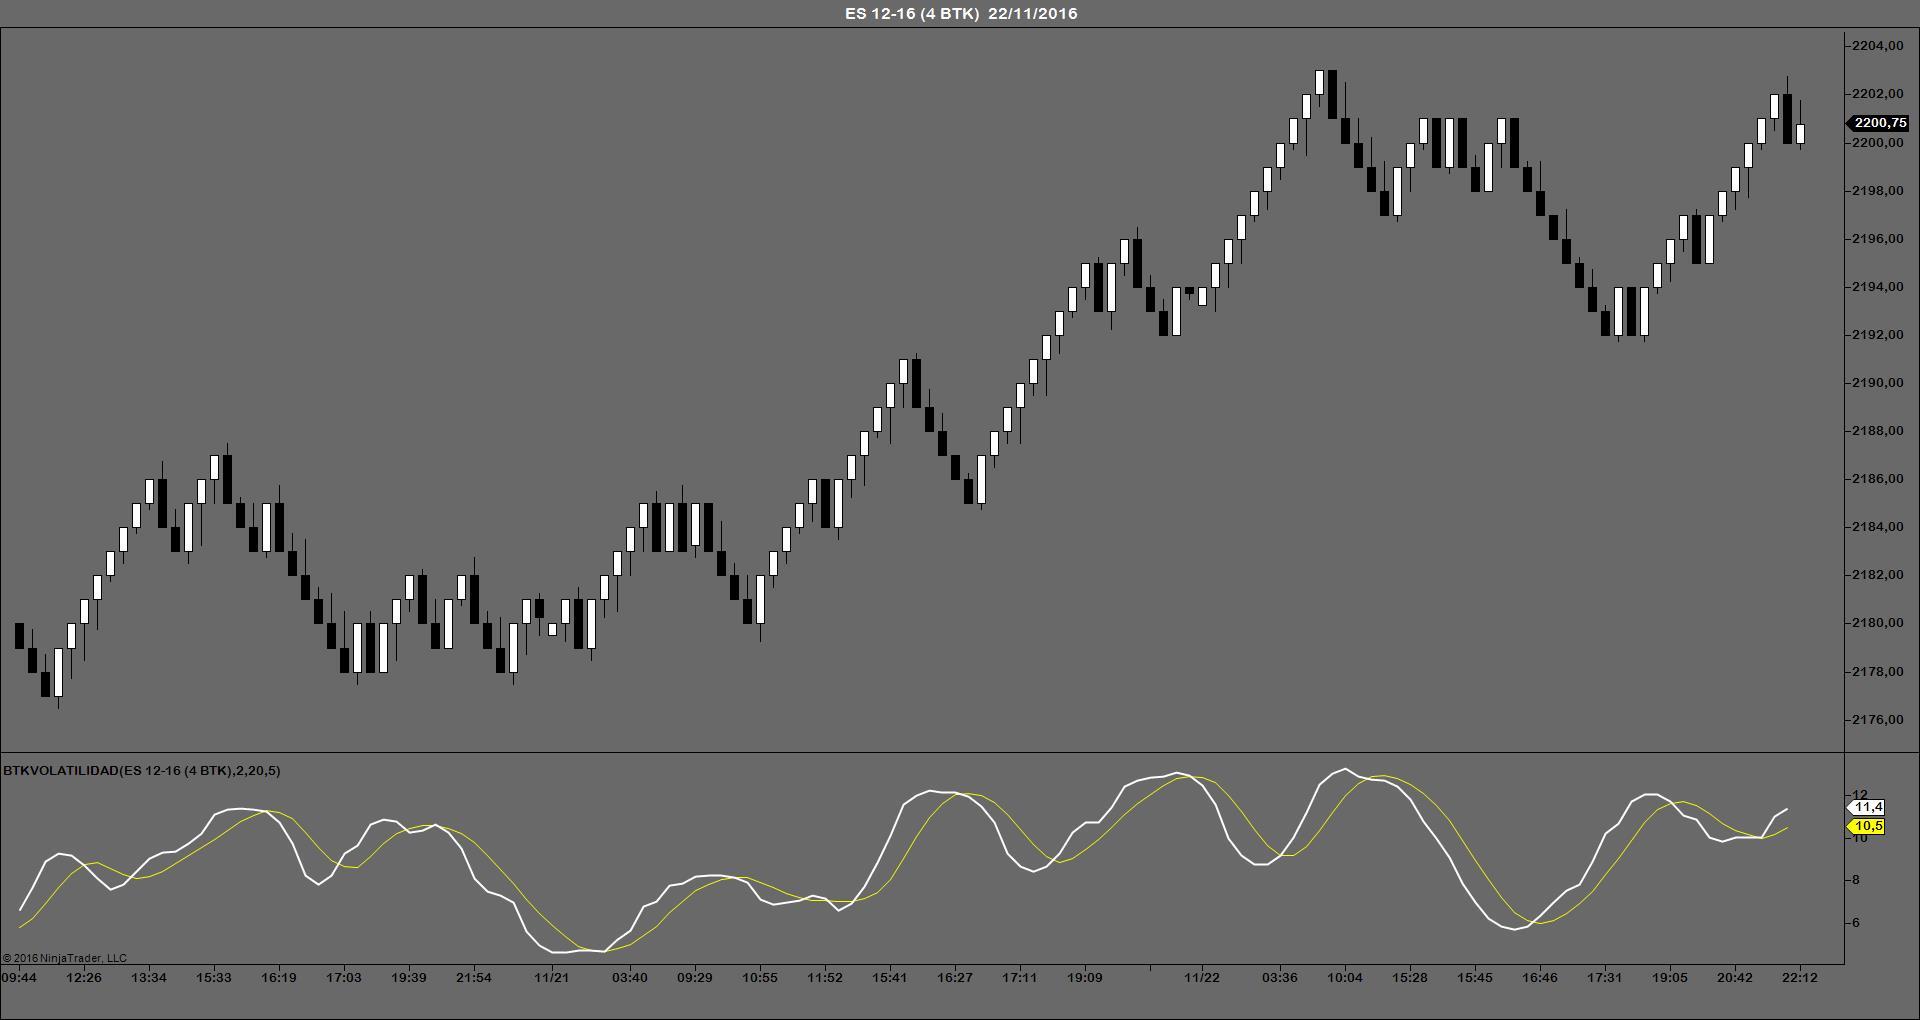 BTKVOLATILIDAD indicador trading